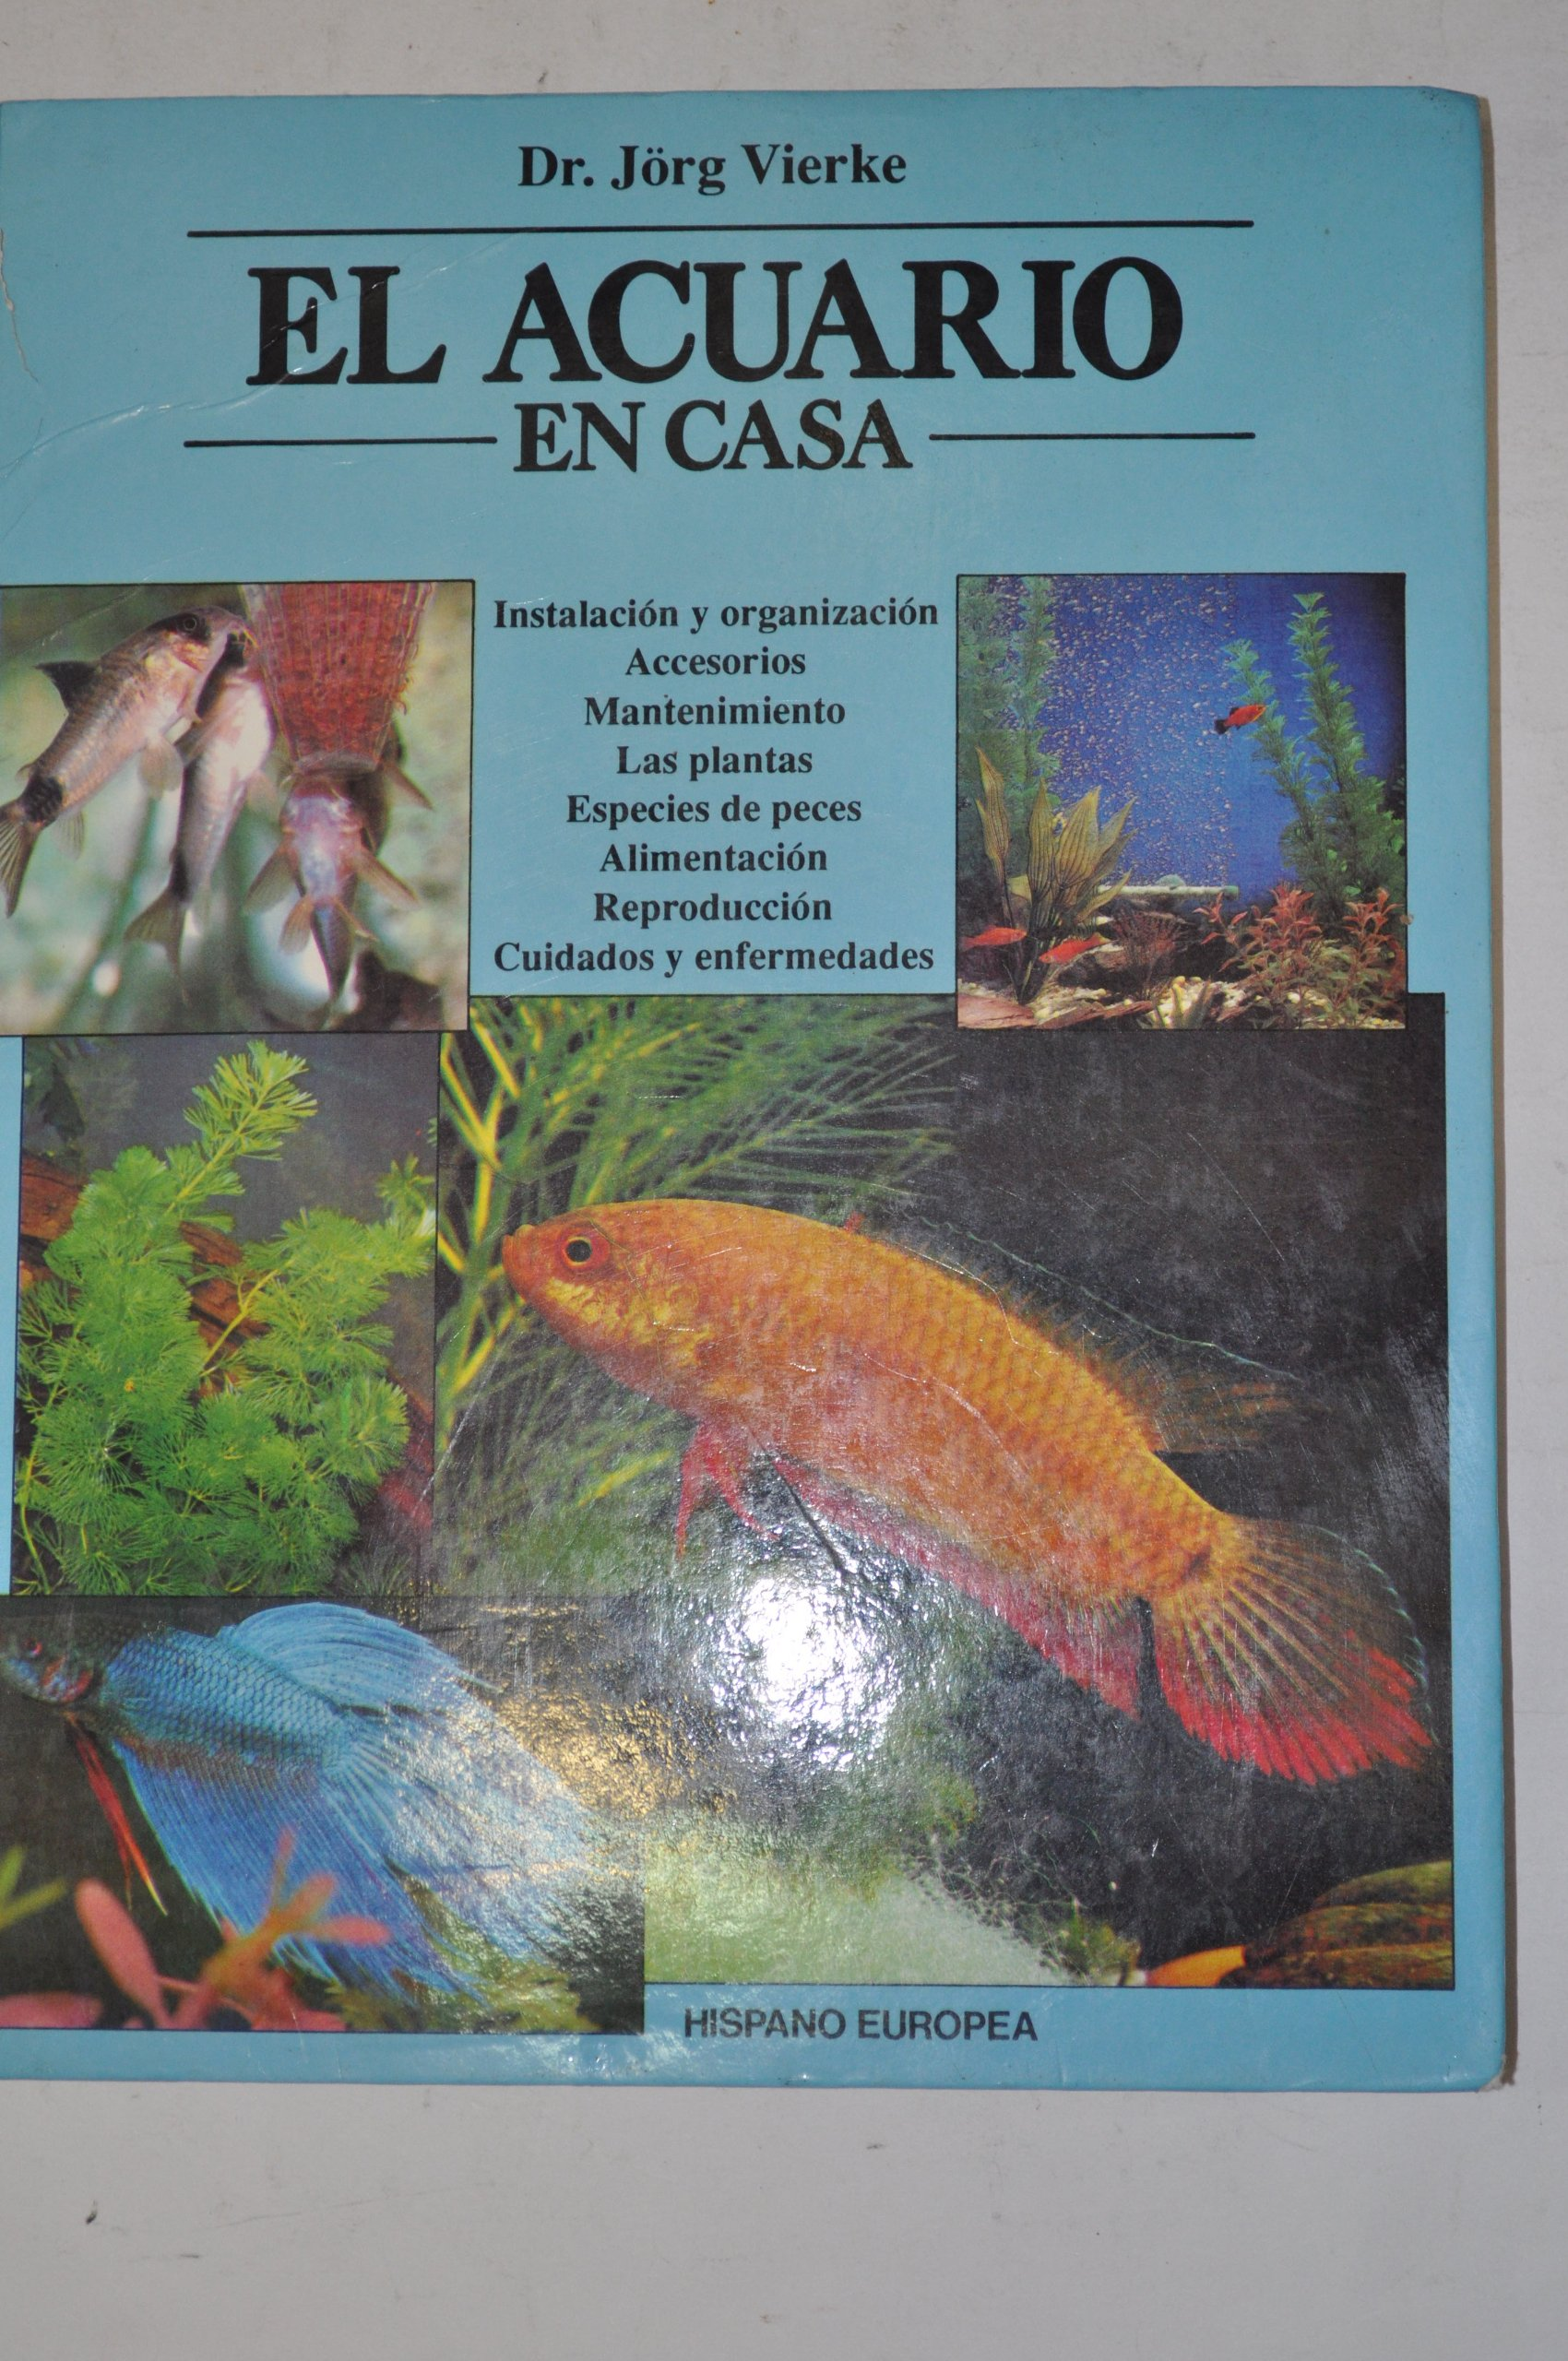 El acuario en casa / The aquarium at home (Spanish Edition) (Spanish) Hardcover – June 30, 1994